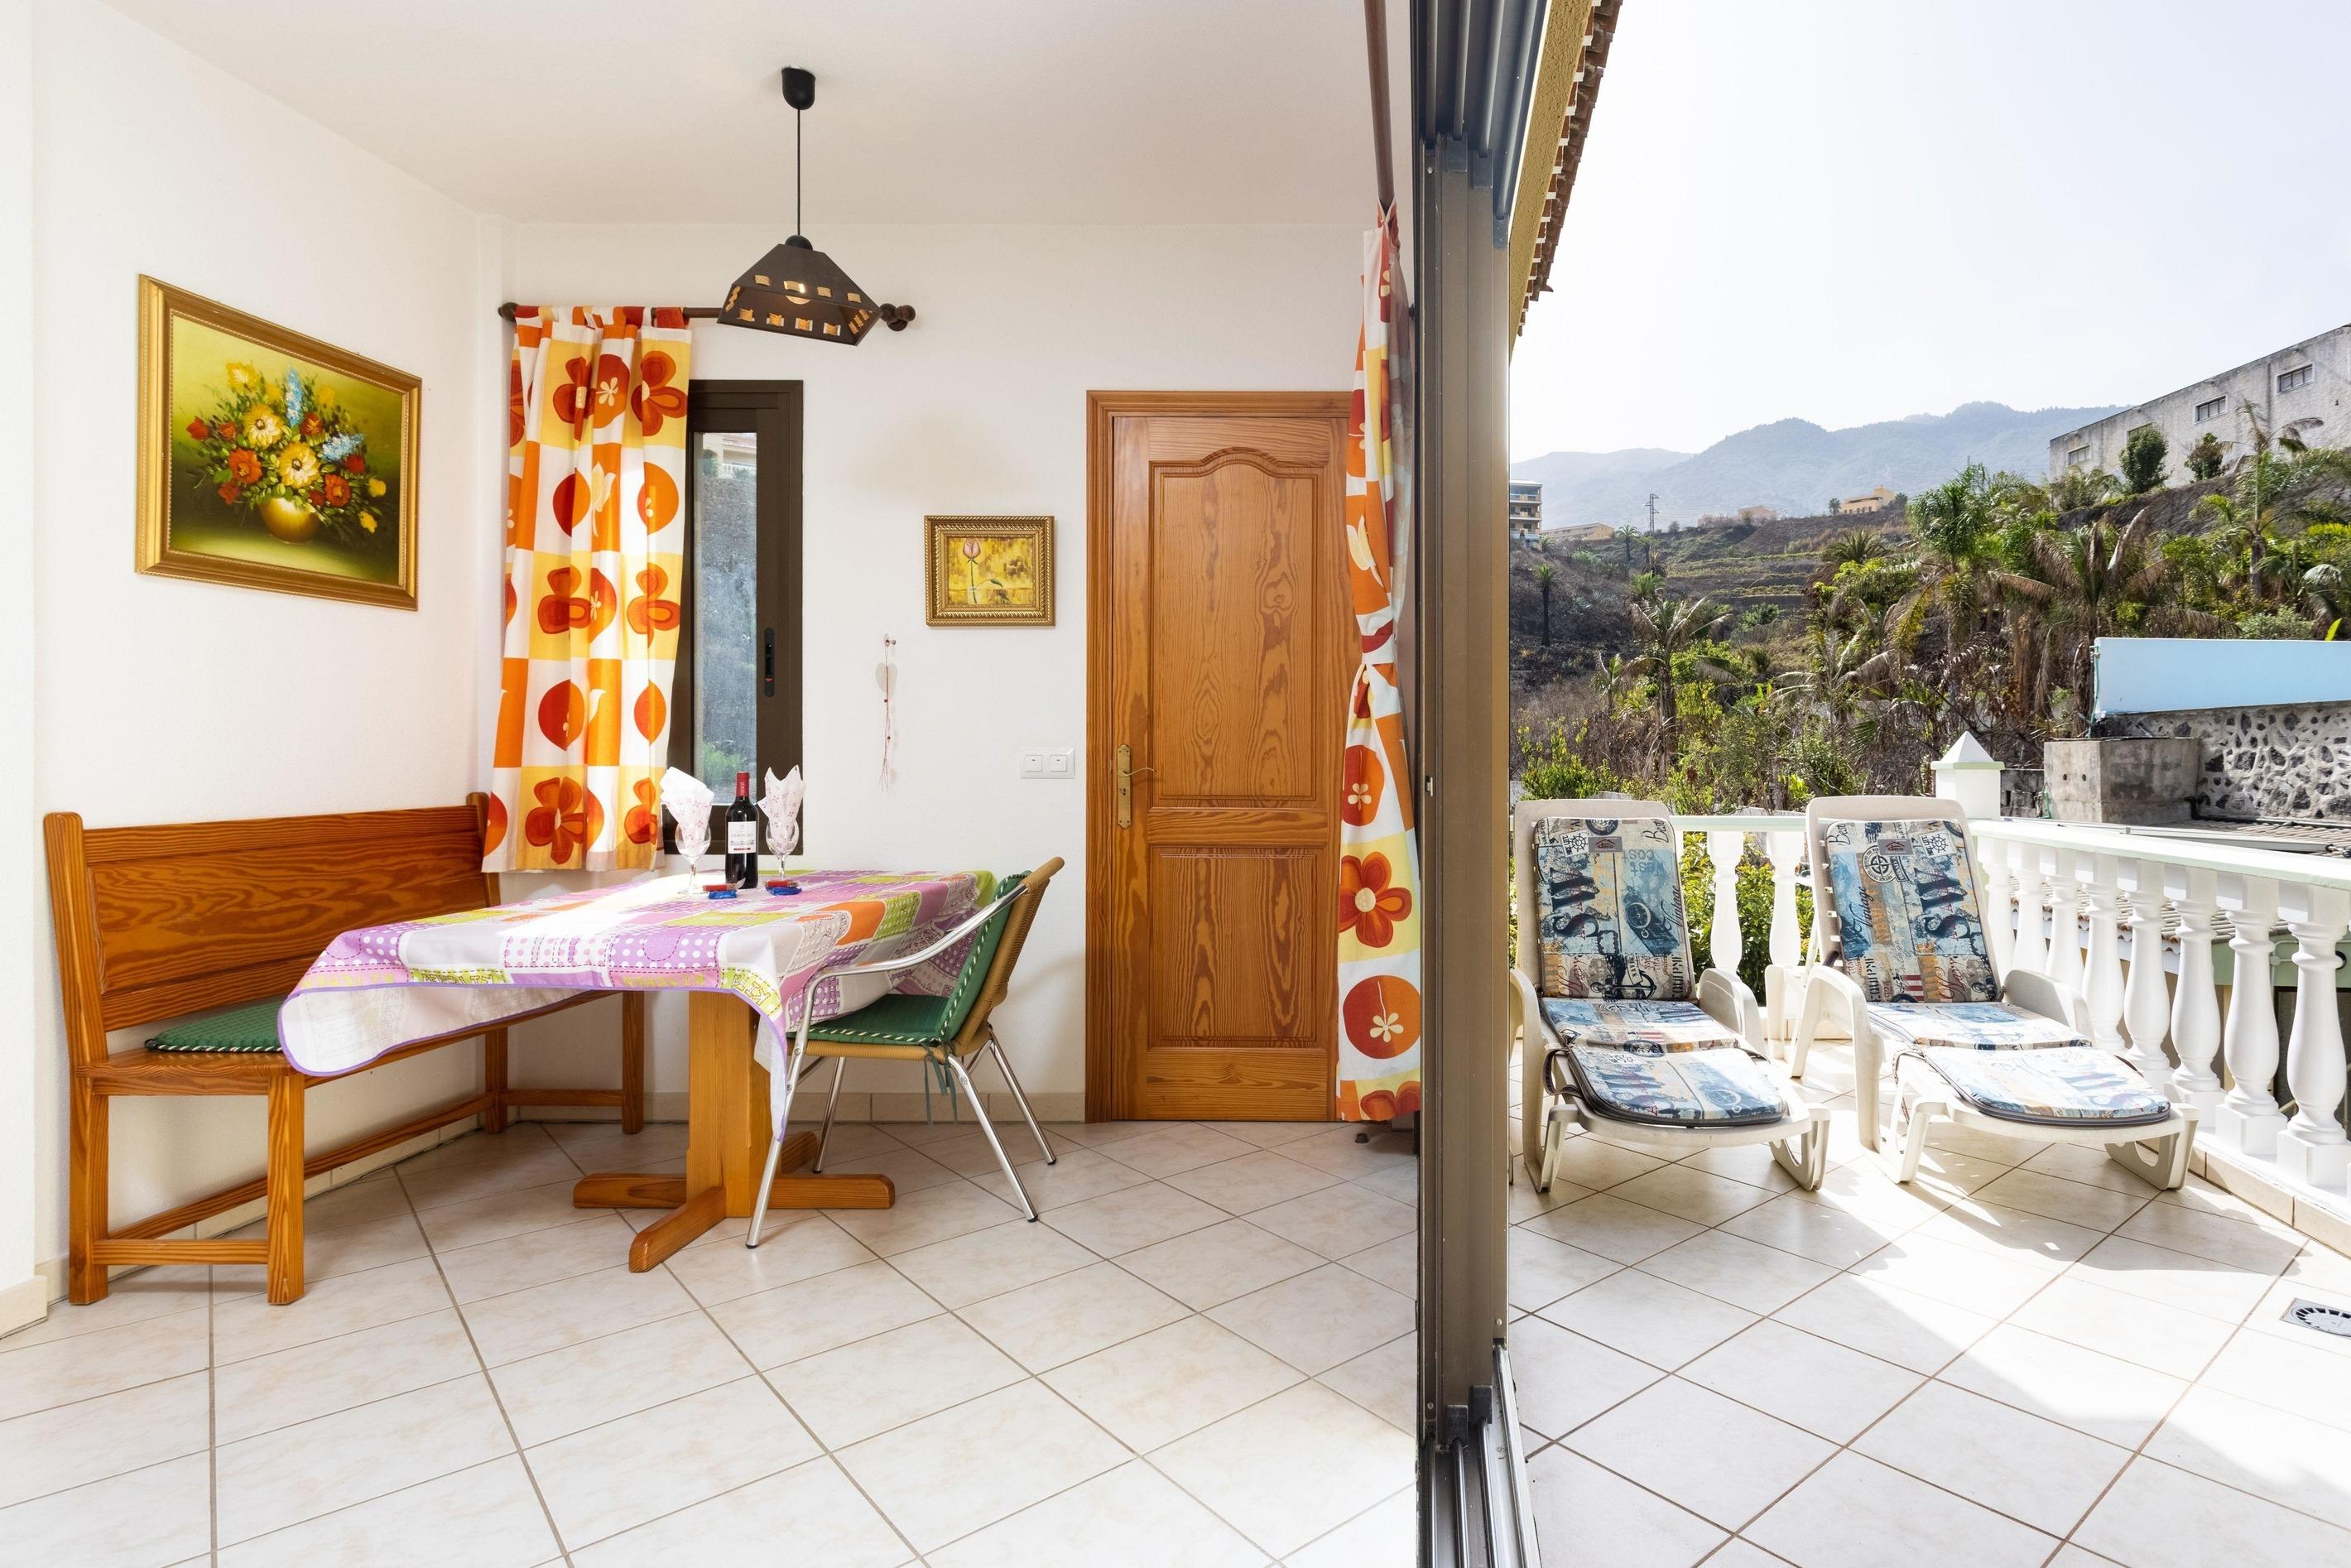 Appartement de vacances Fewo Atico Florasol, sehr ruhig direkt am Naturschutzgebiet, mit Pool, 2 Terrassen, Grill, (2492983), Santa Ursula, Ténérife, Iles Canaries, Espagne, image 5